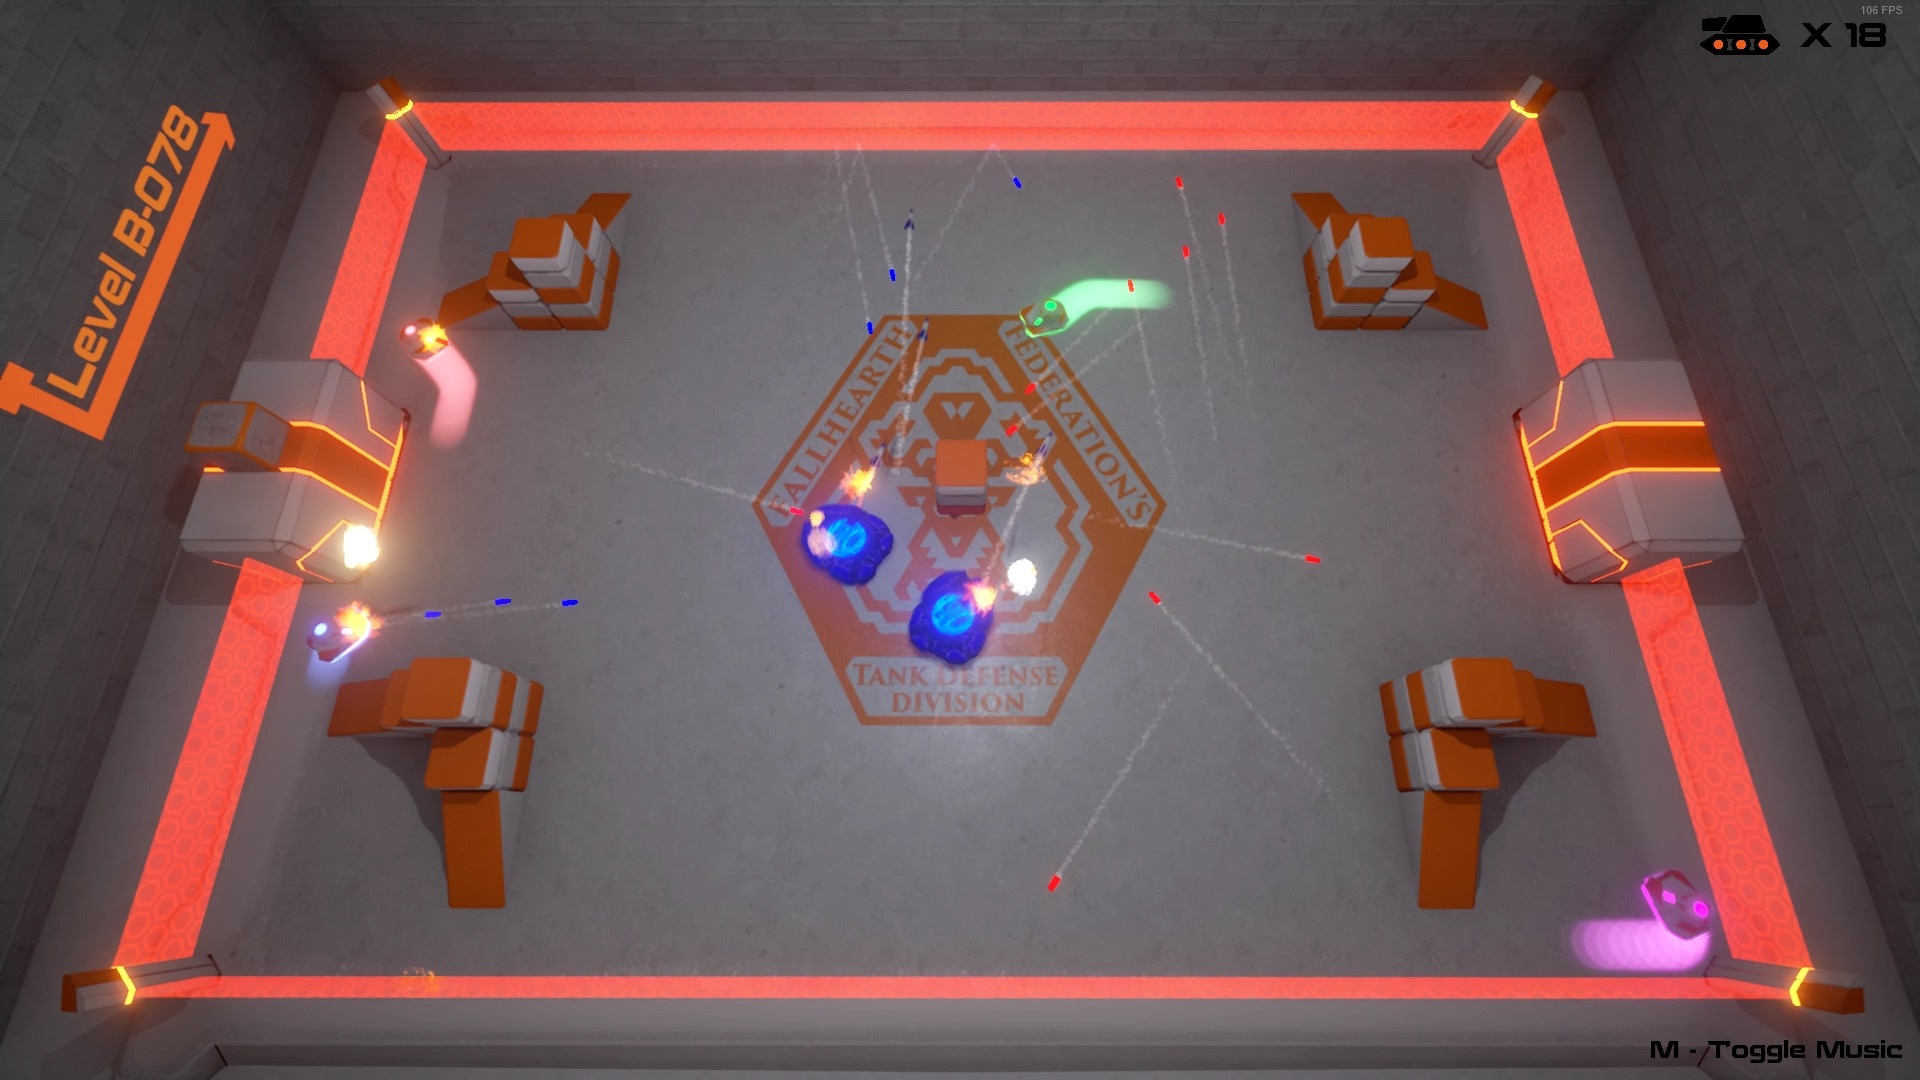 Tank Defense Division Screenshot 2